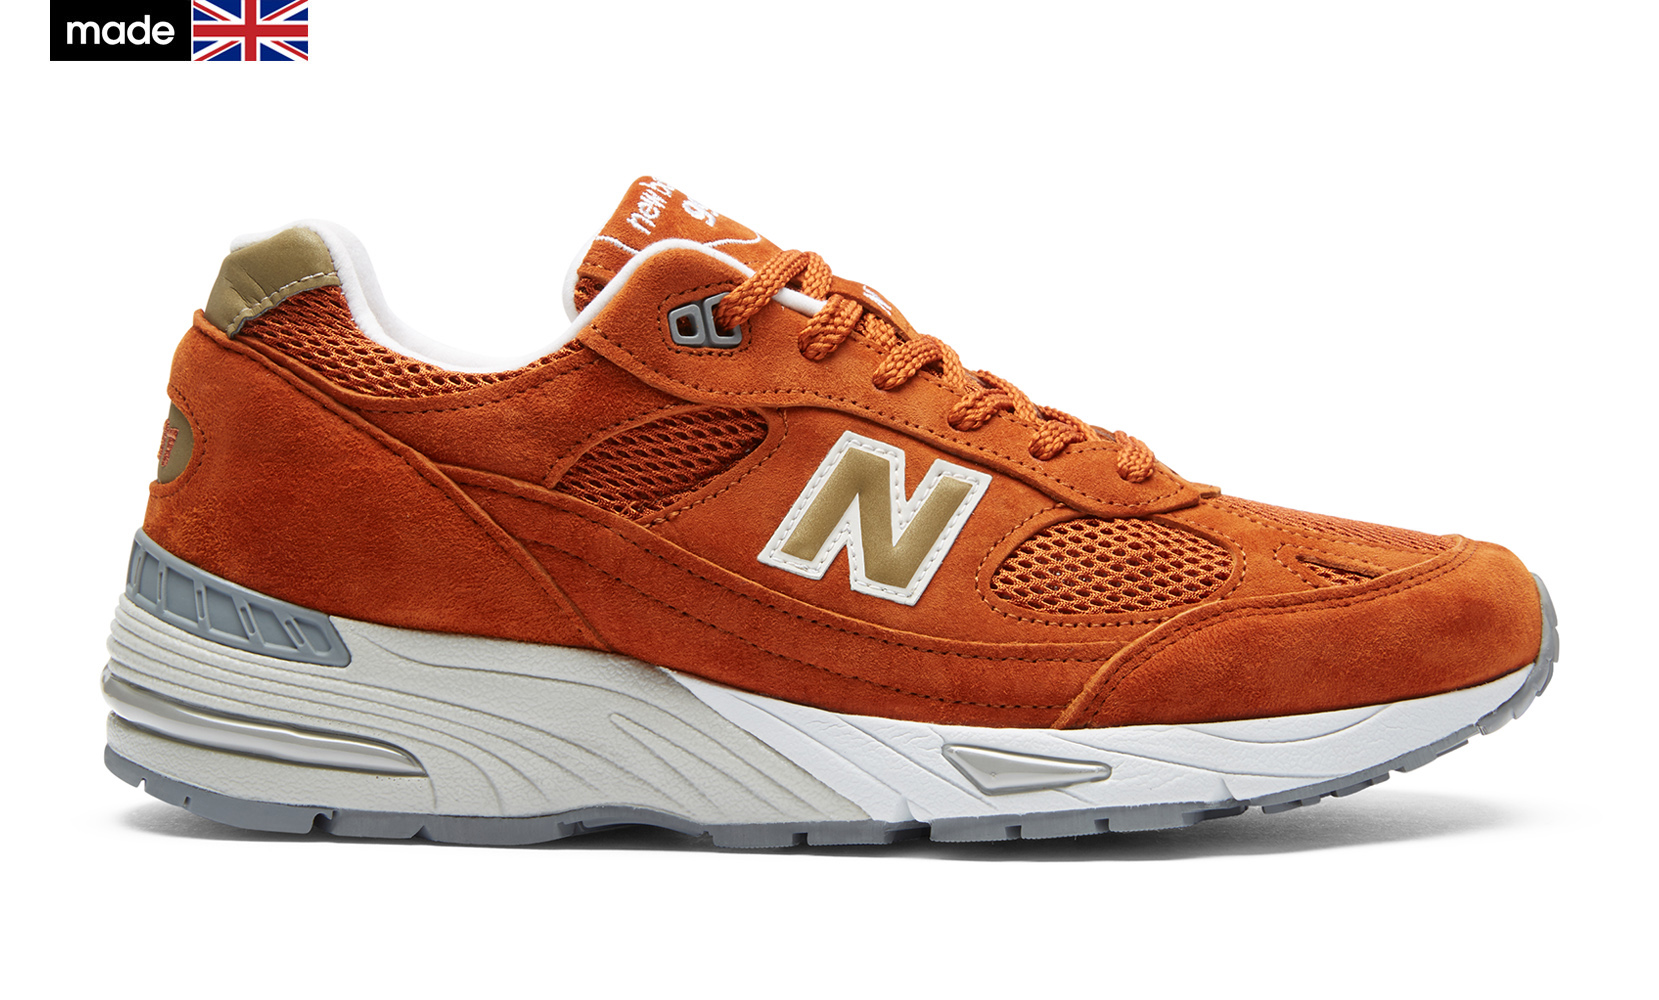 Чоловіче взуття повсякденне New Balance 991 Made in UK M991SE | New Balance